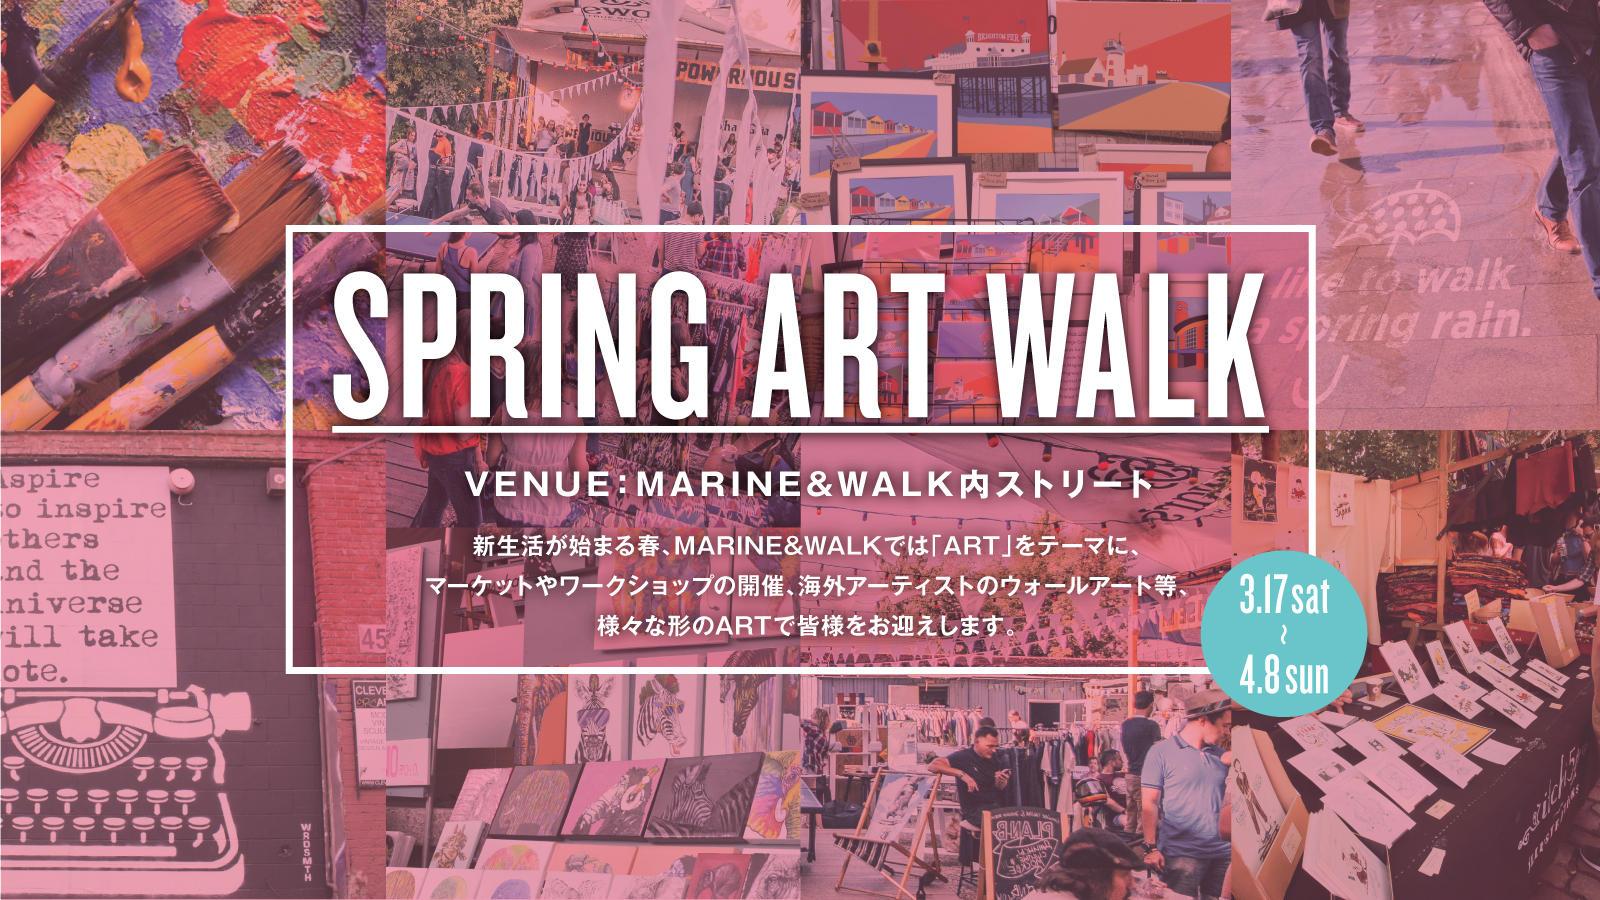 SPRING ART WALK 3.17sat-4.8sun